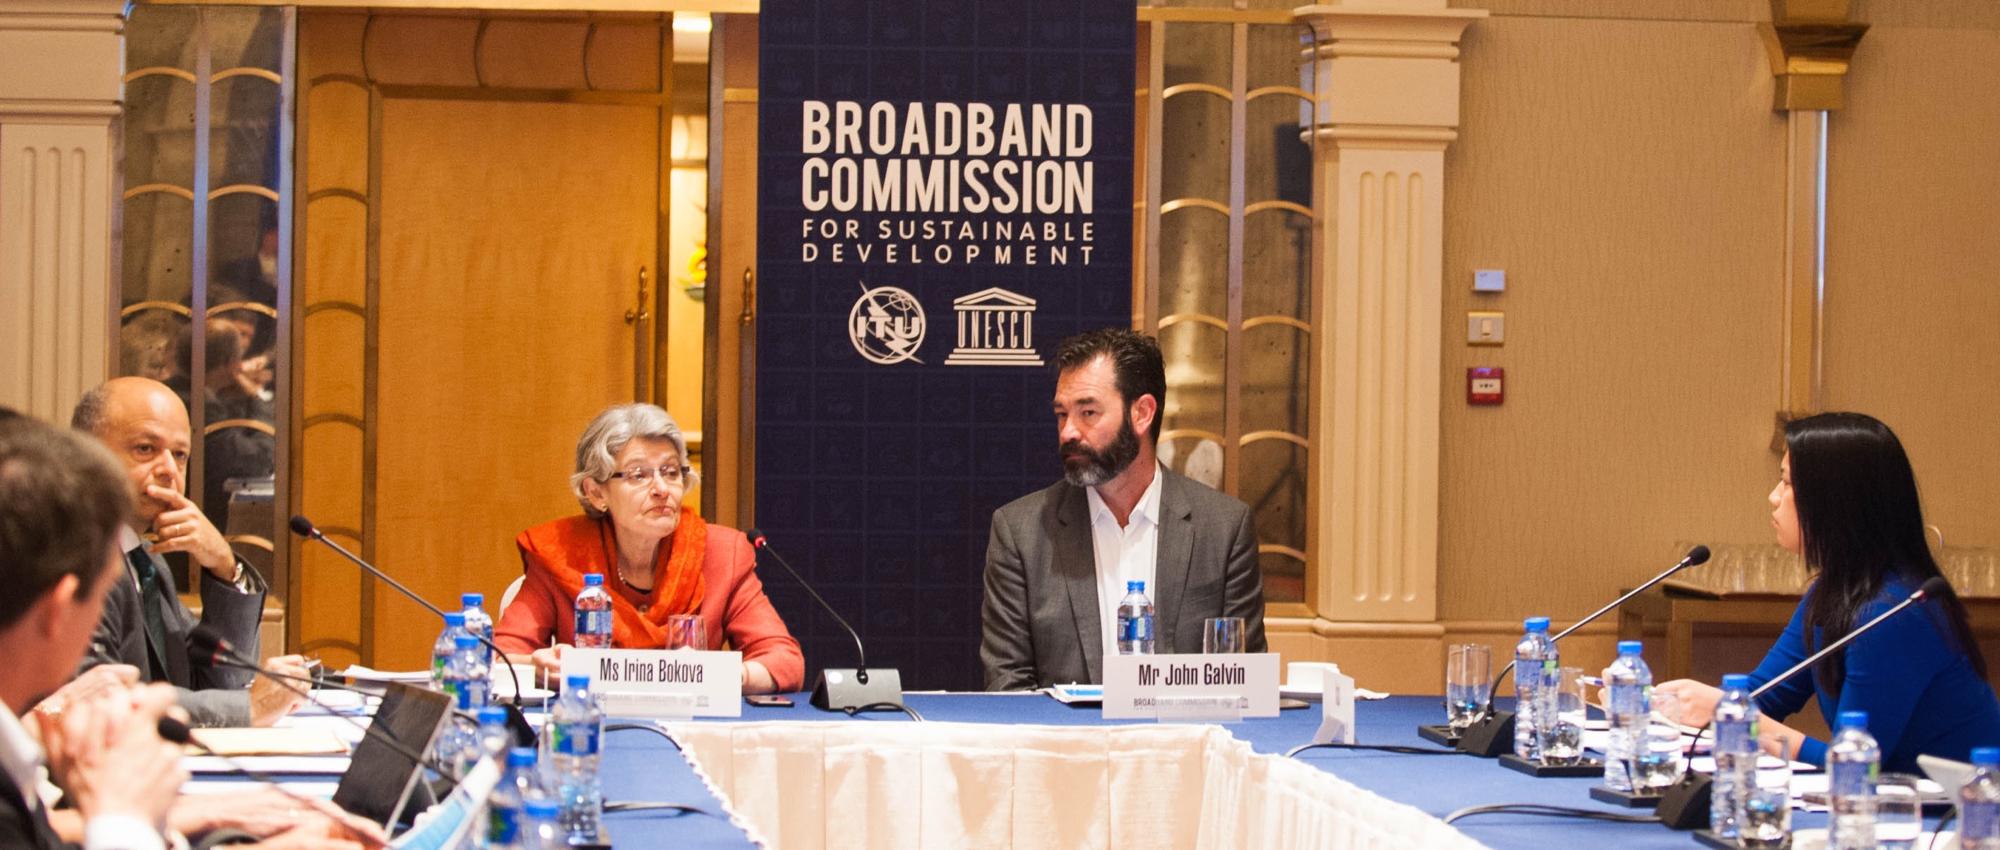 ITU's Broadband Commissioner Meeting with UNESCO's Director General Irina Bokova and Intel VP & GM John Galvin